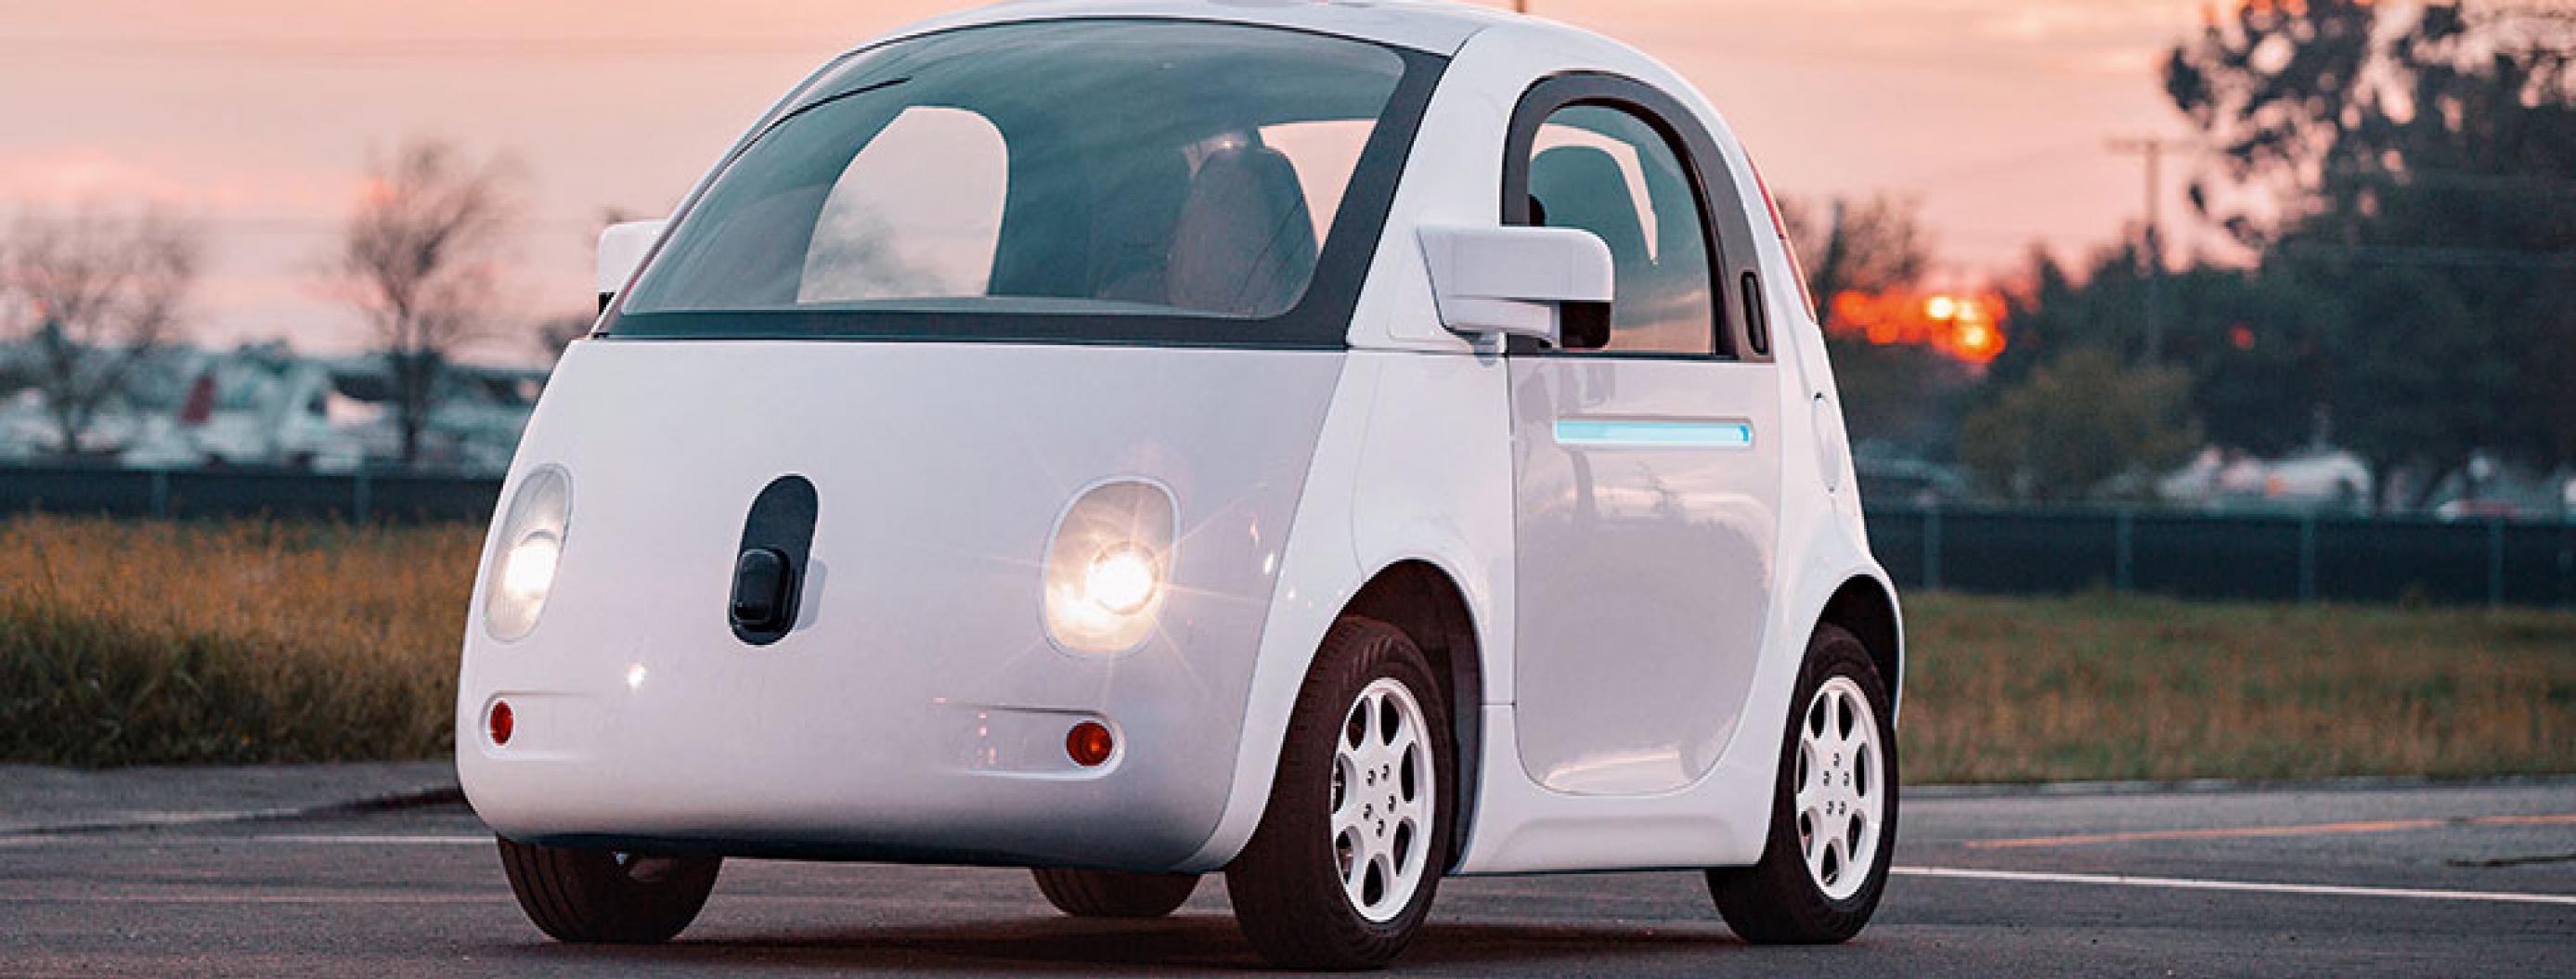 Will Self-Driving Cars Speak Human?